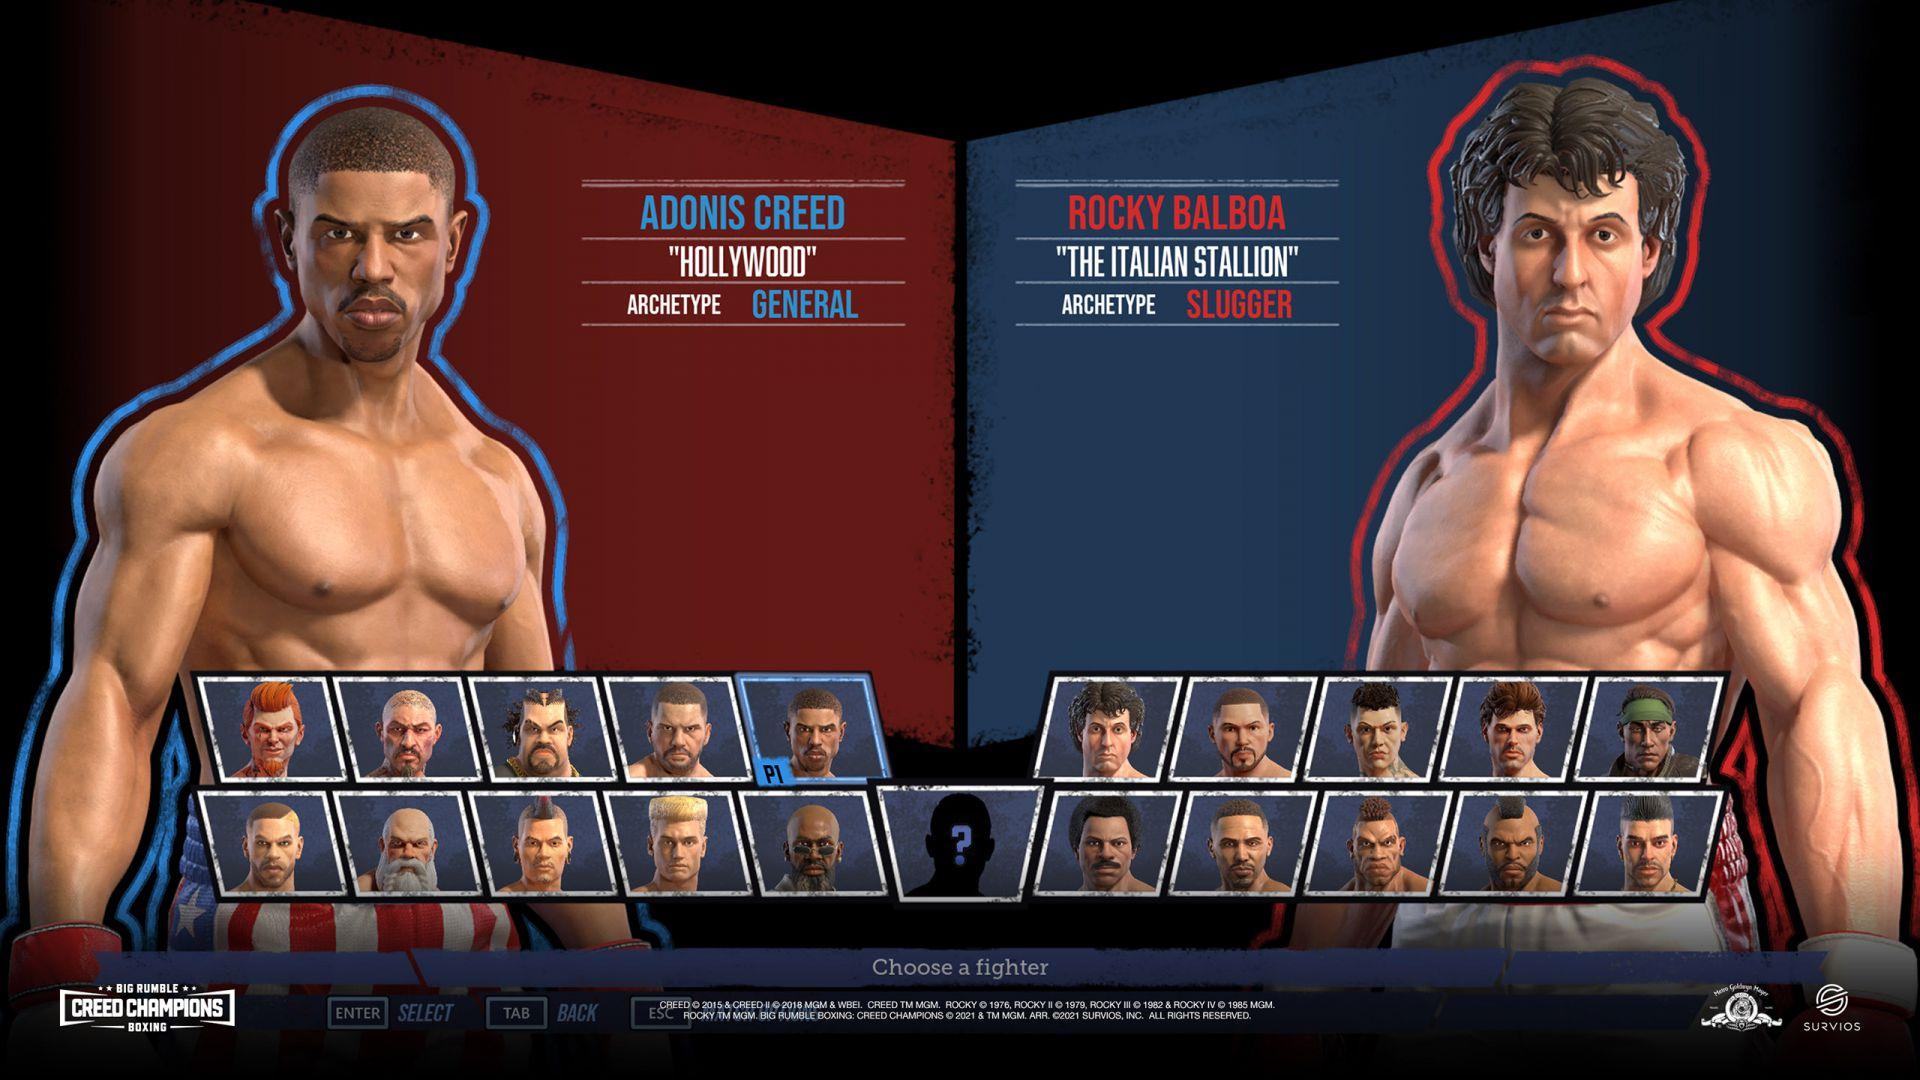 big rumble boxing creed champions 8 - generacion xbox